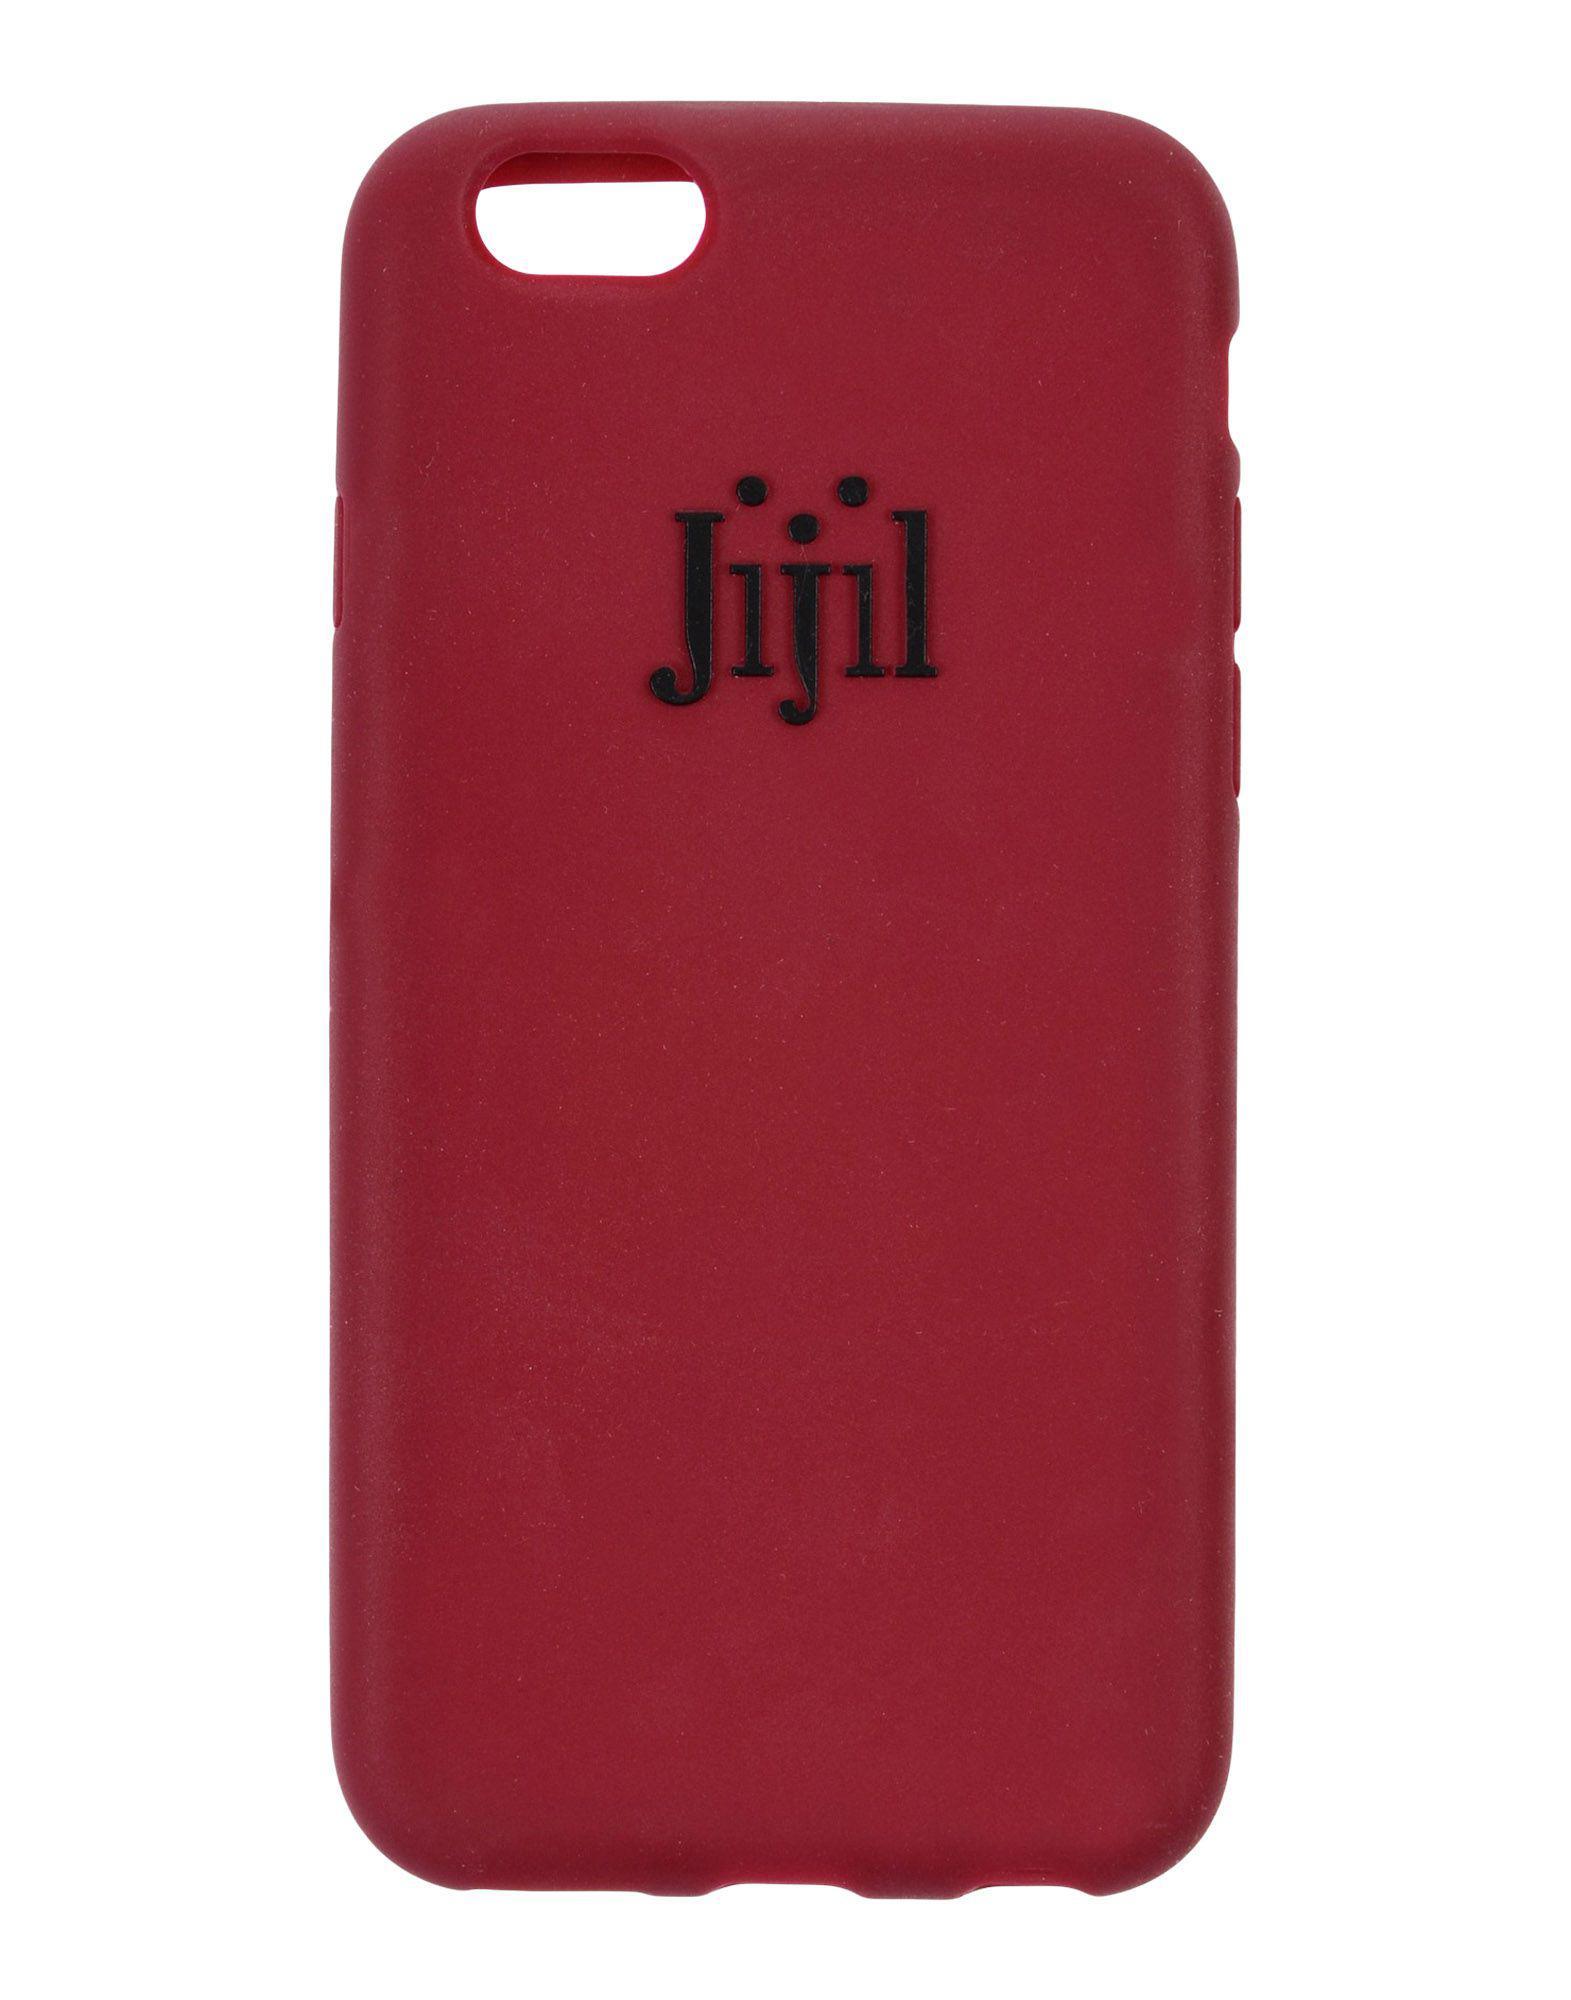 HI-TECH - Hi-tech Accessories Jijil eGkmWEtA